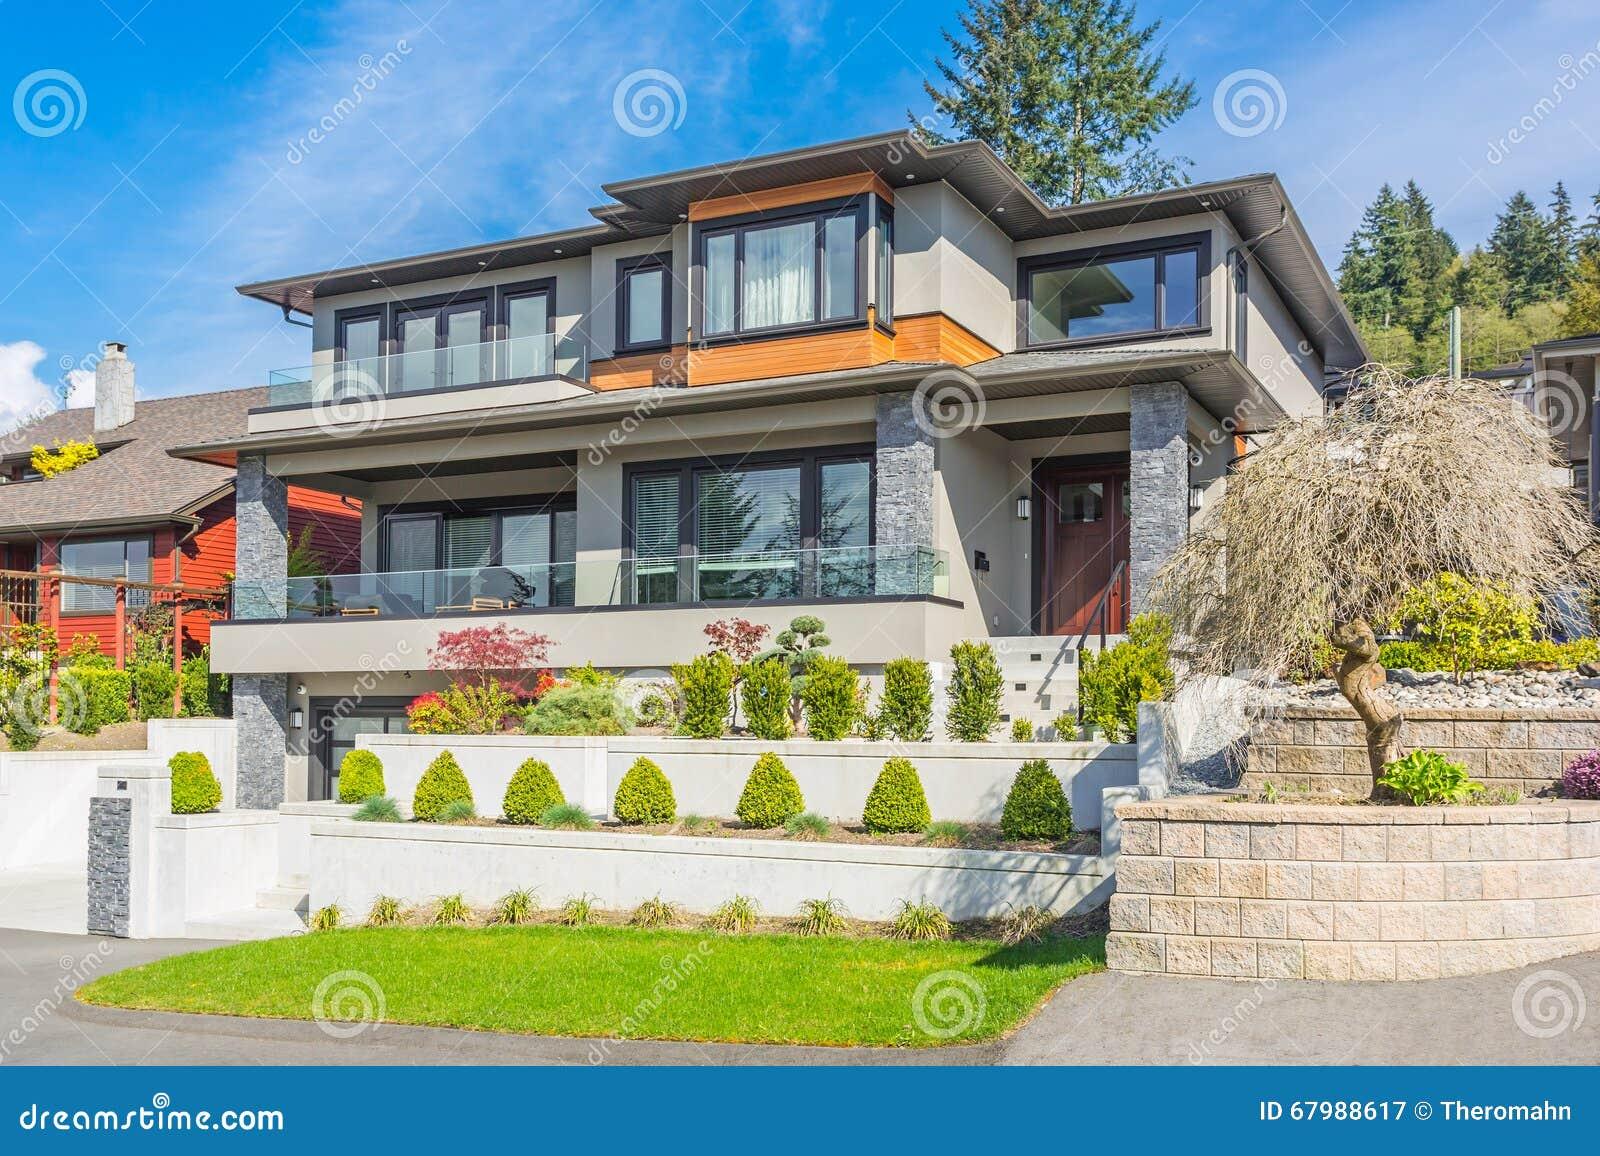 Custom Built House Stock Photo Image 67988617